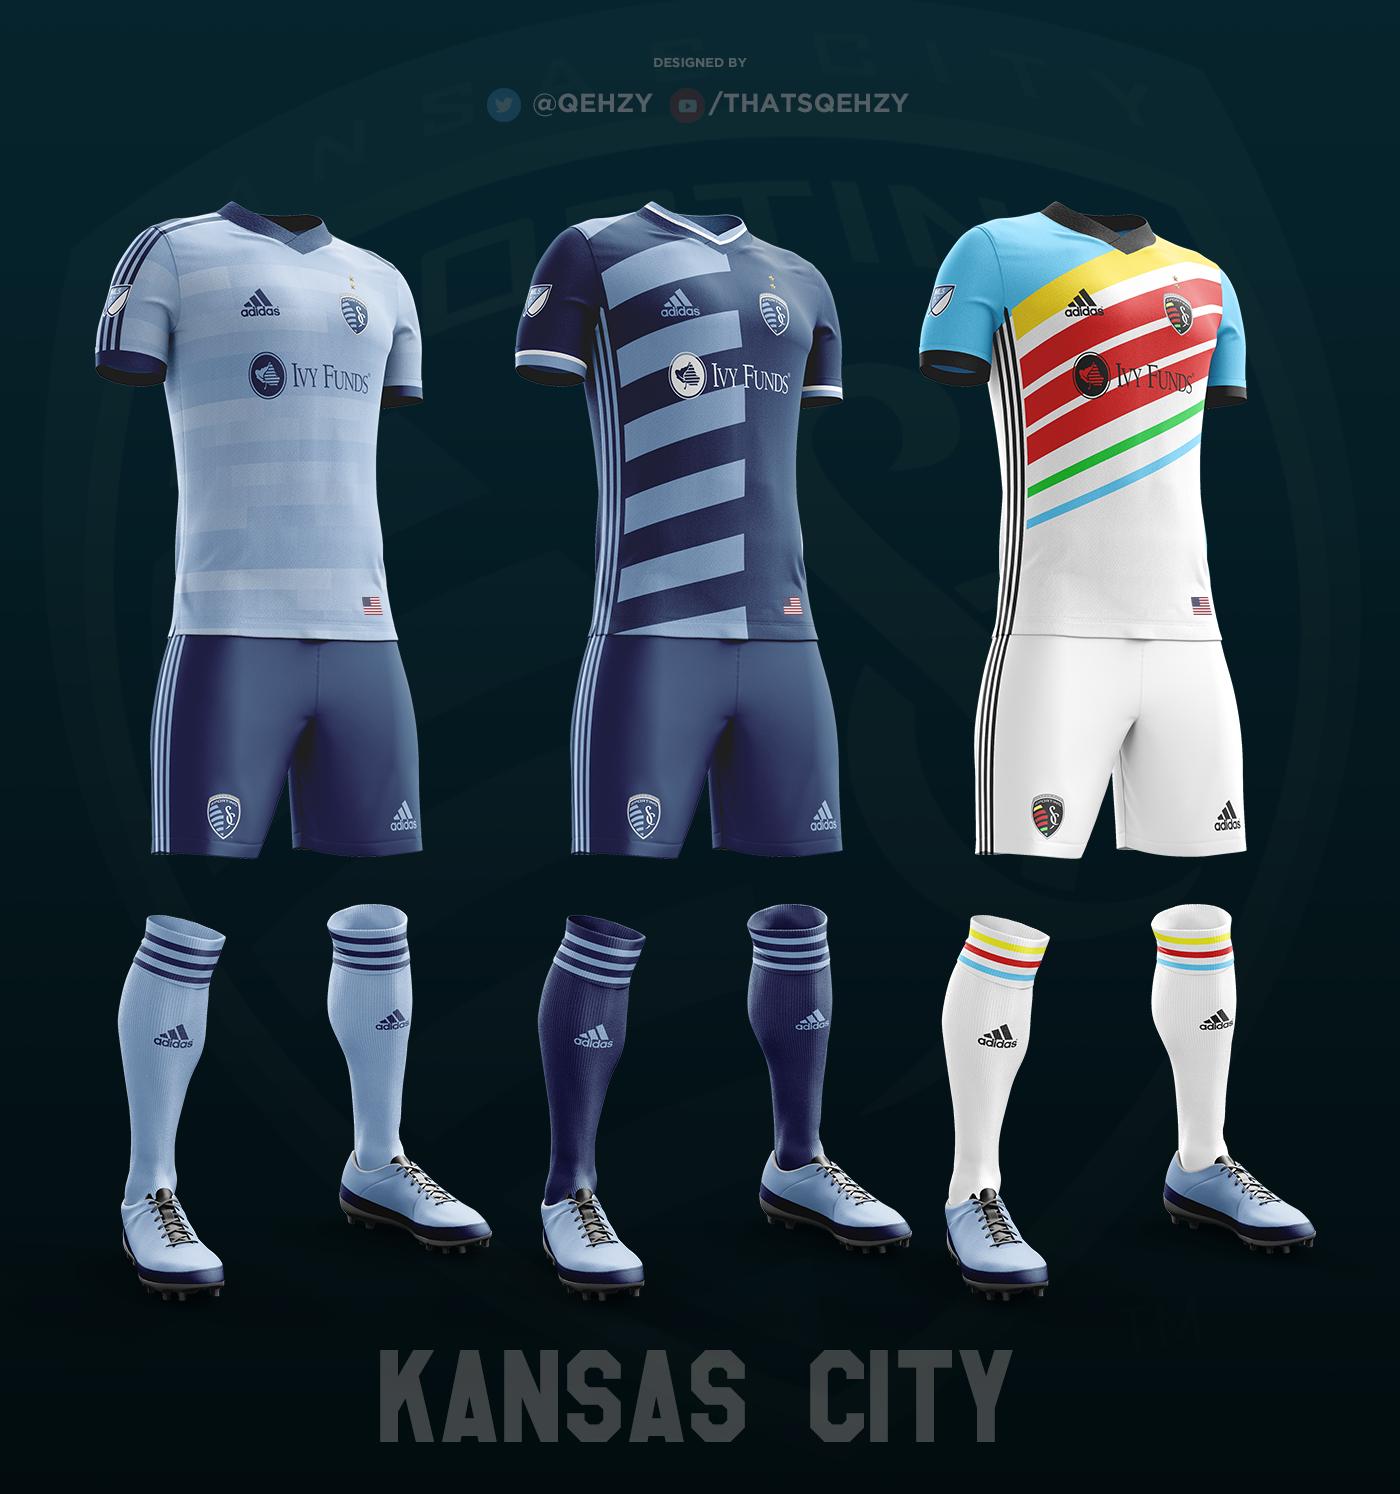 e597dce2b MLS Kits Redesigned (2017) on Behance